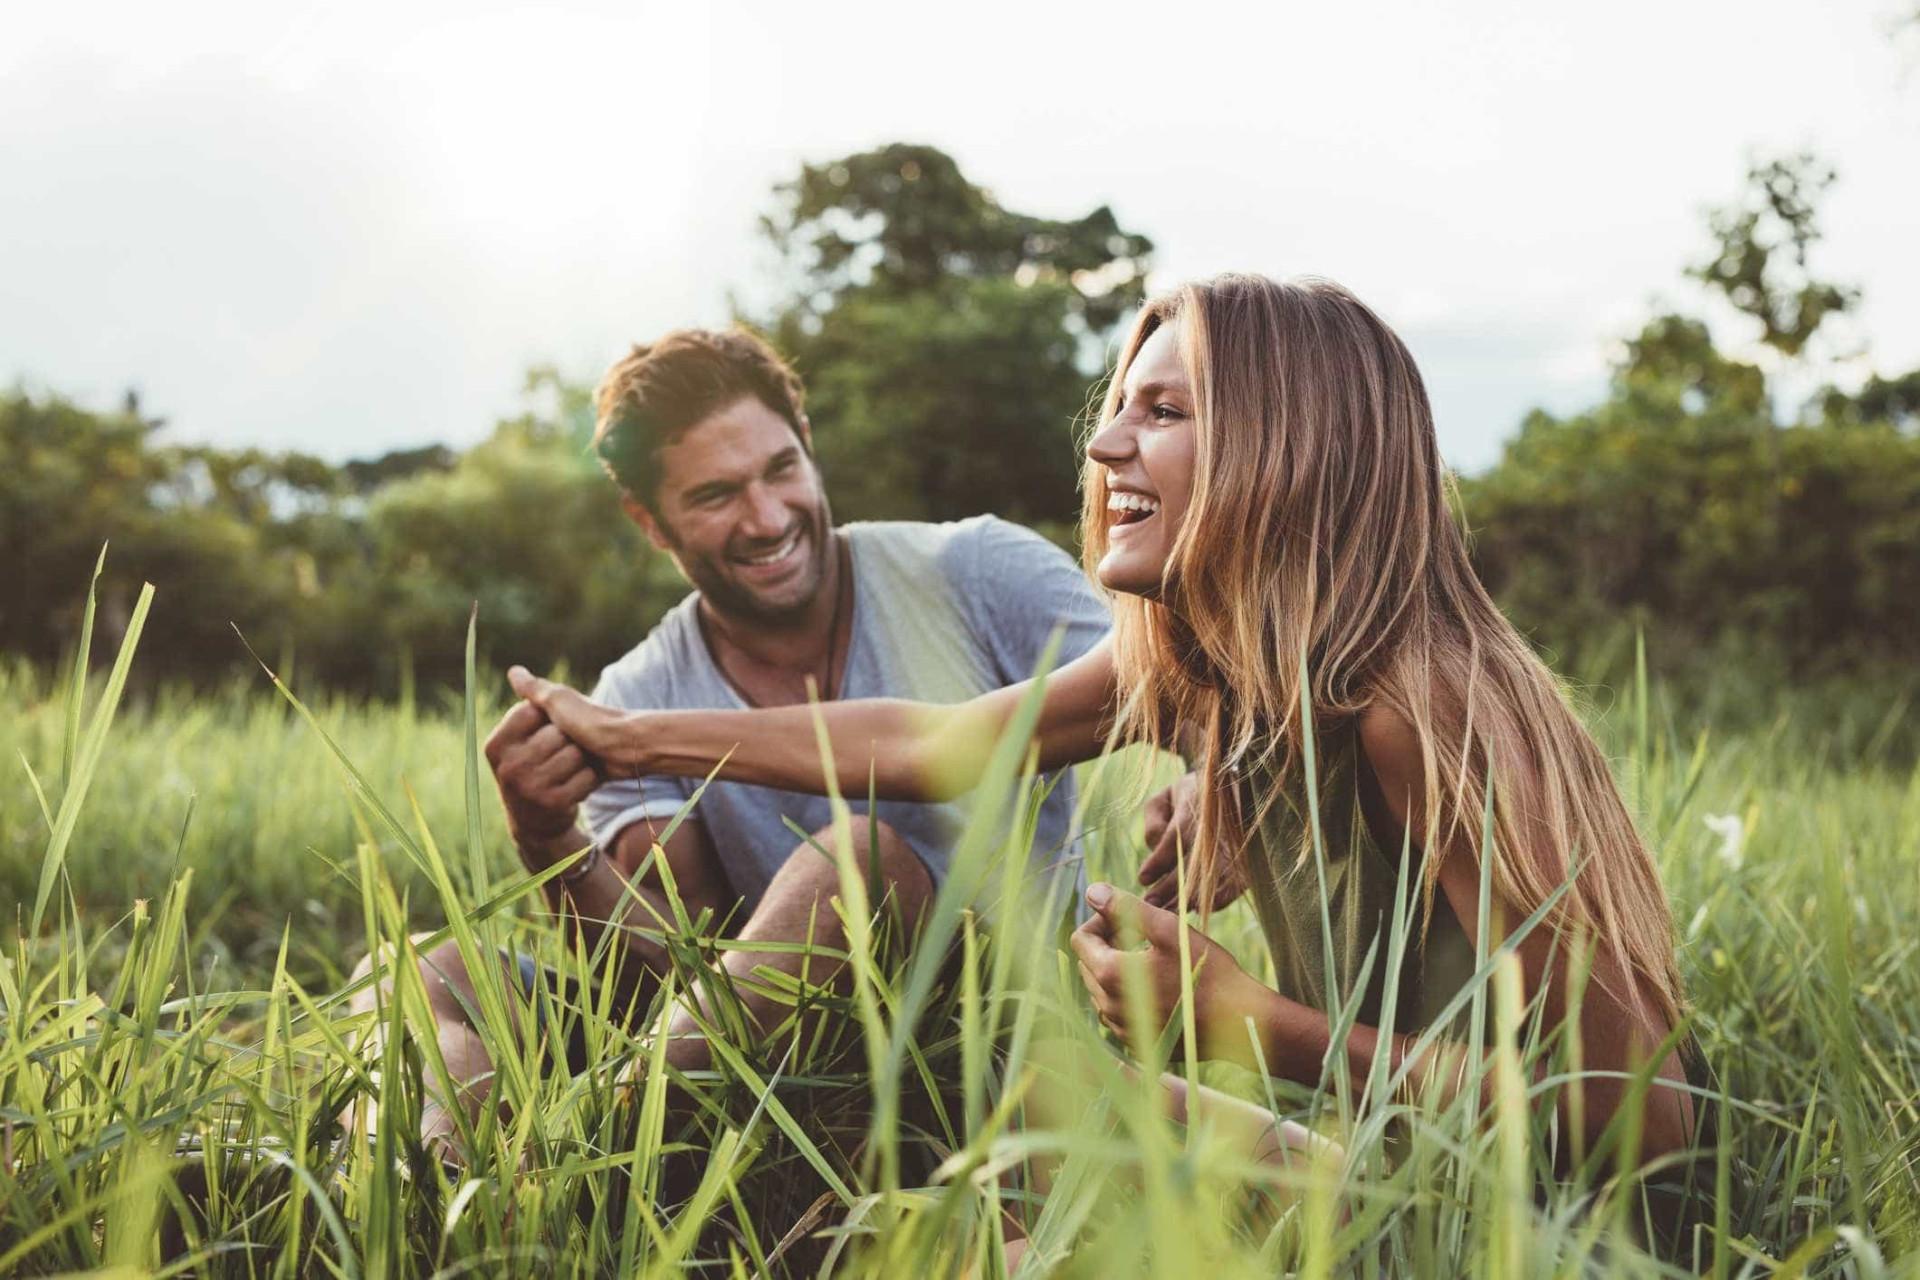 Dez fatores que podem aumentar a probabilidade de divórcio